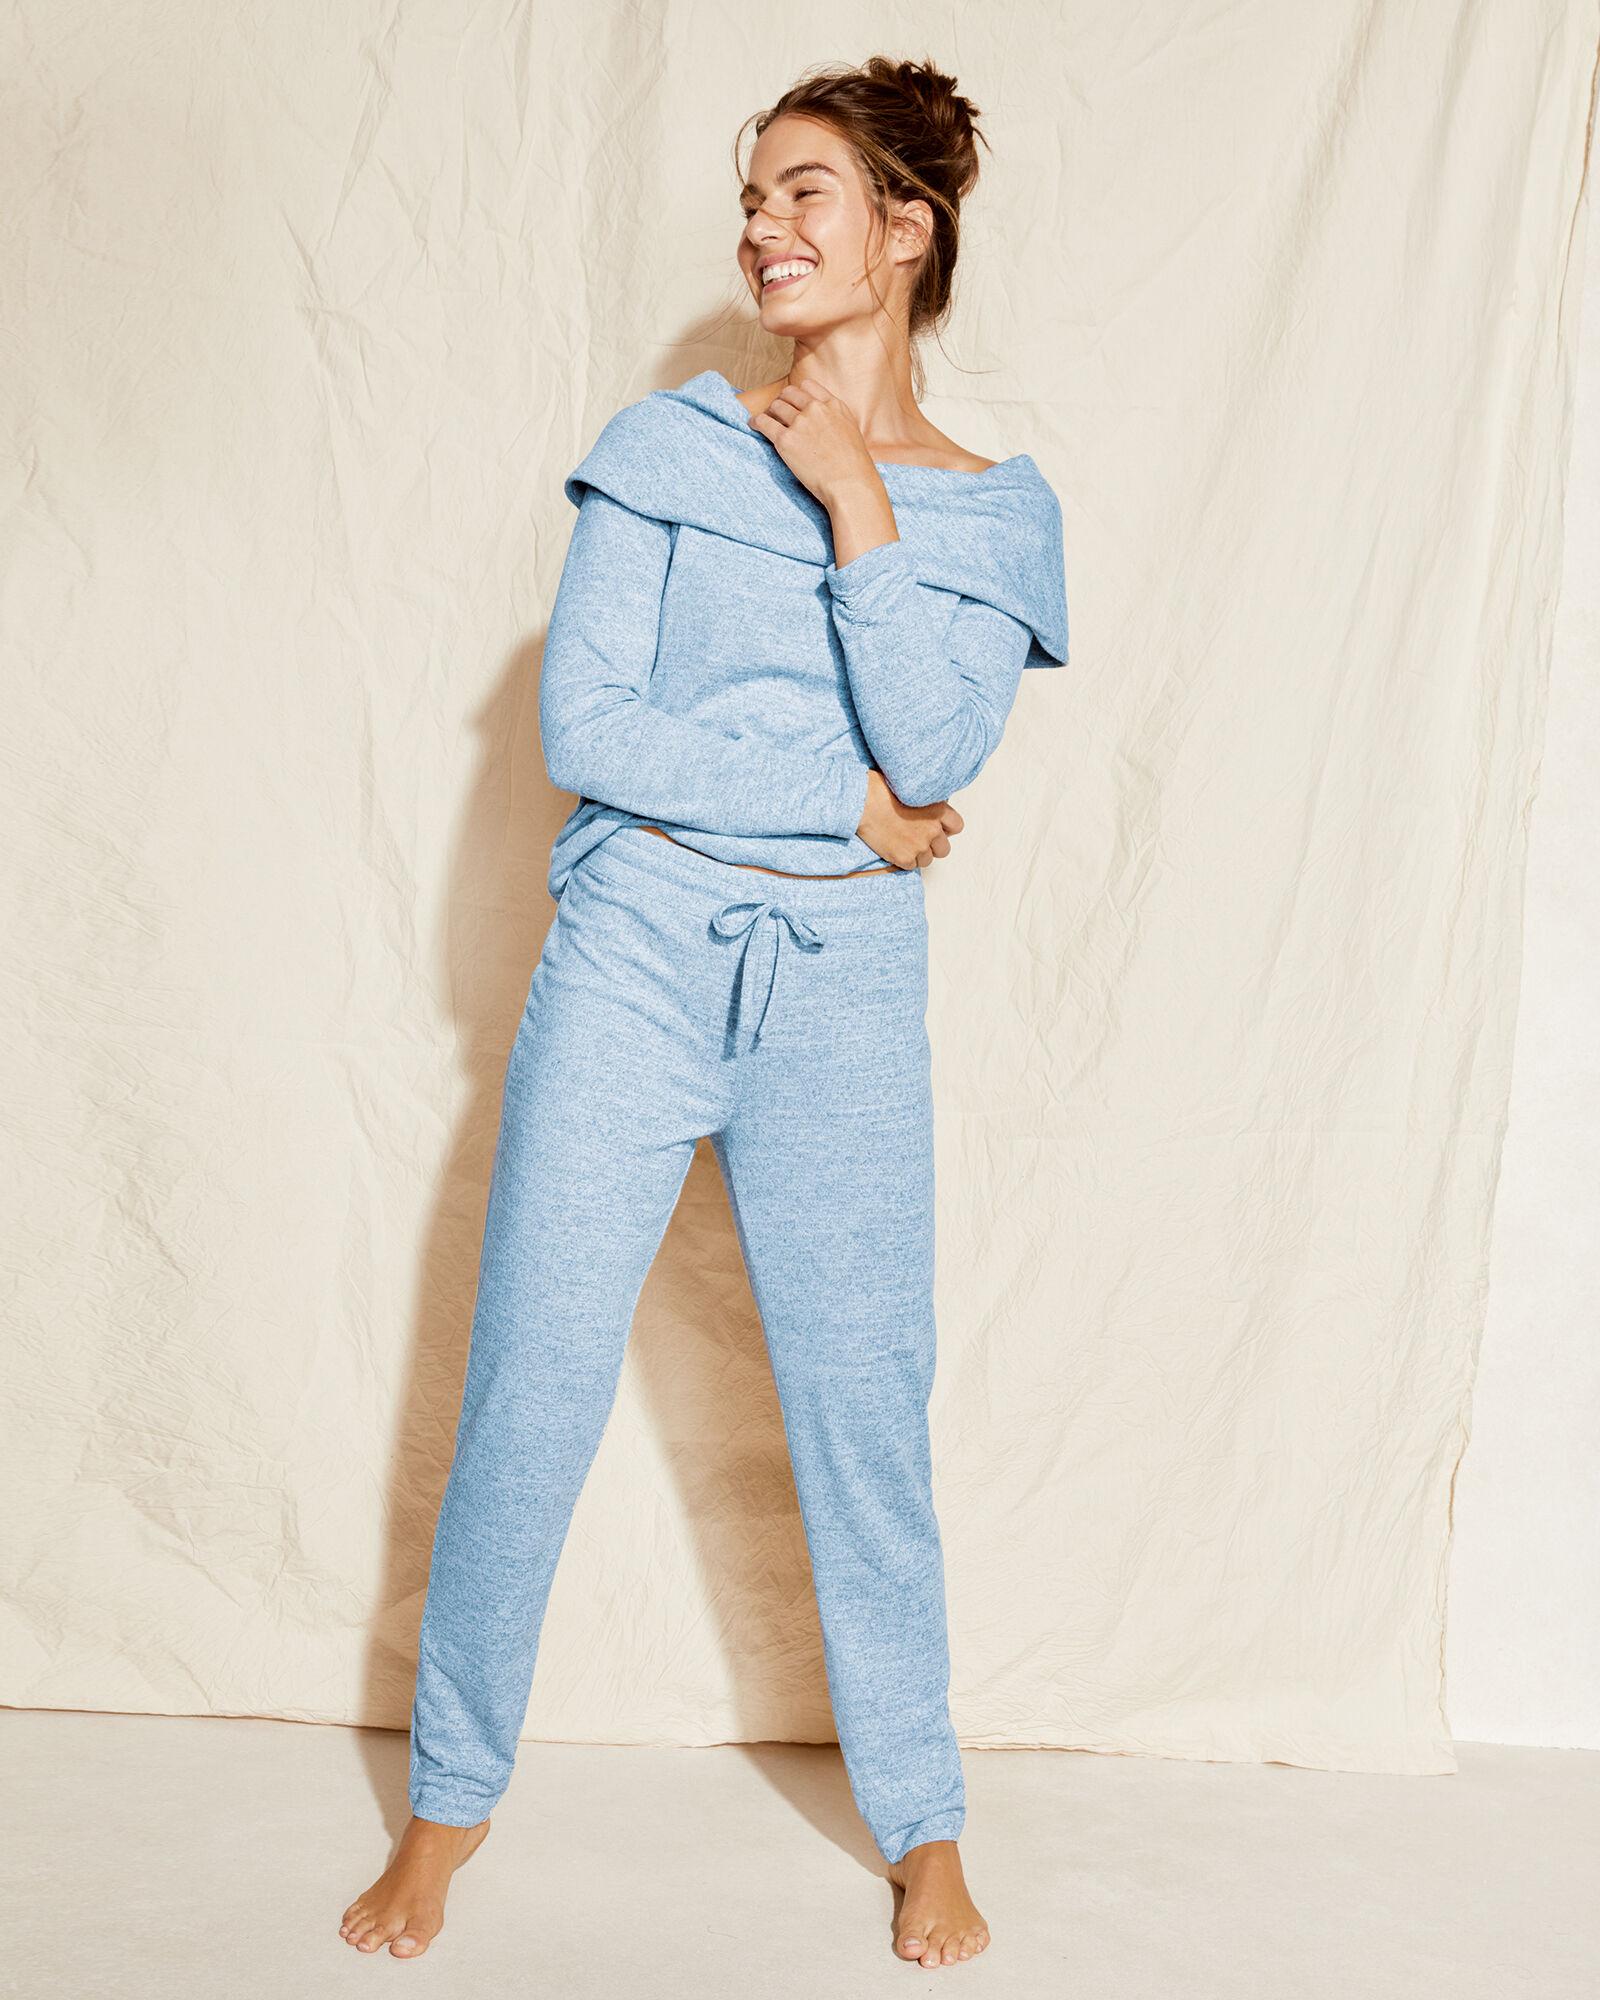 Talbots Marled Pants - Soft Icy Blue Heather - Large Talbots  - Soft Icy Blue Heather - Size: female - Size: Large